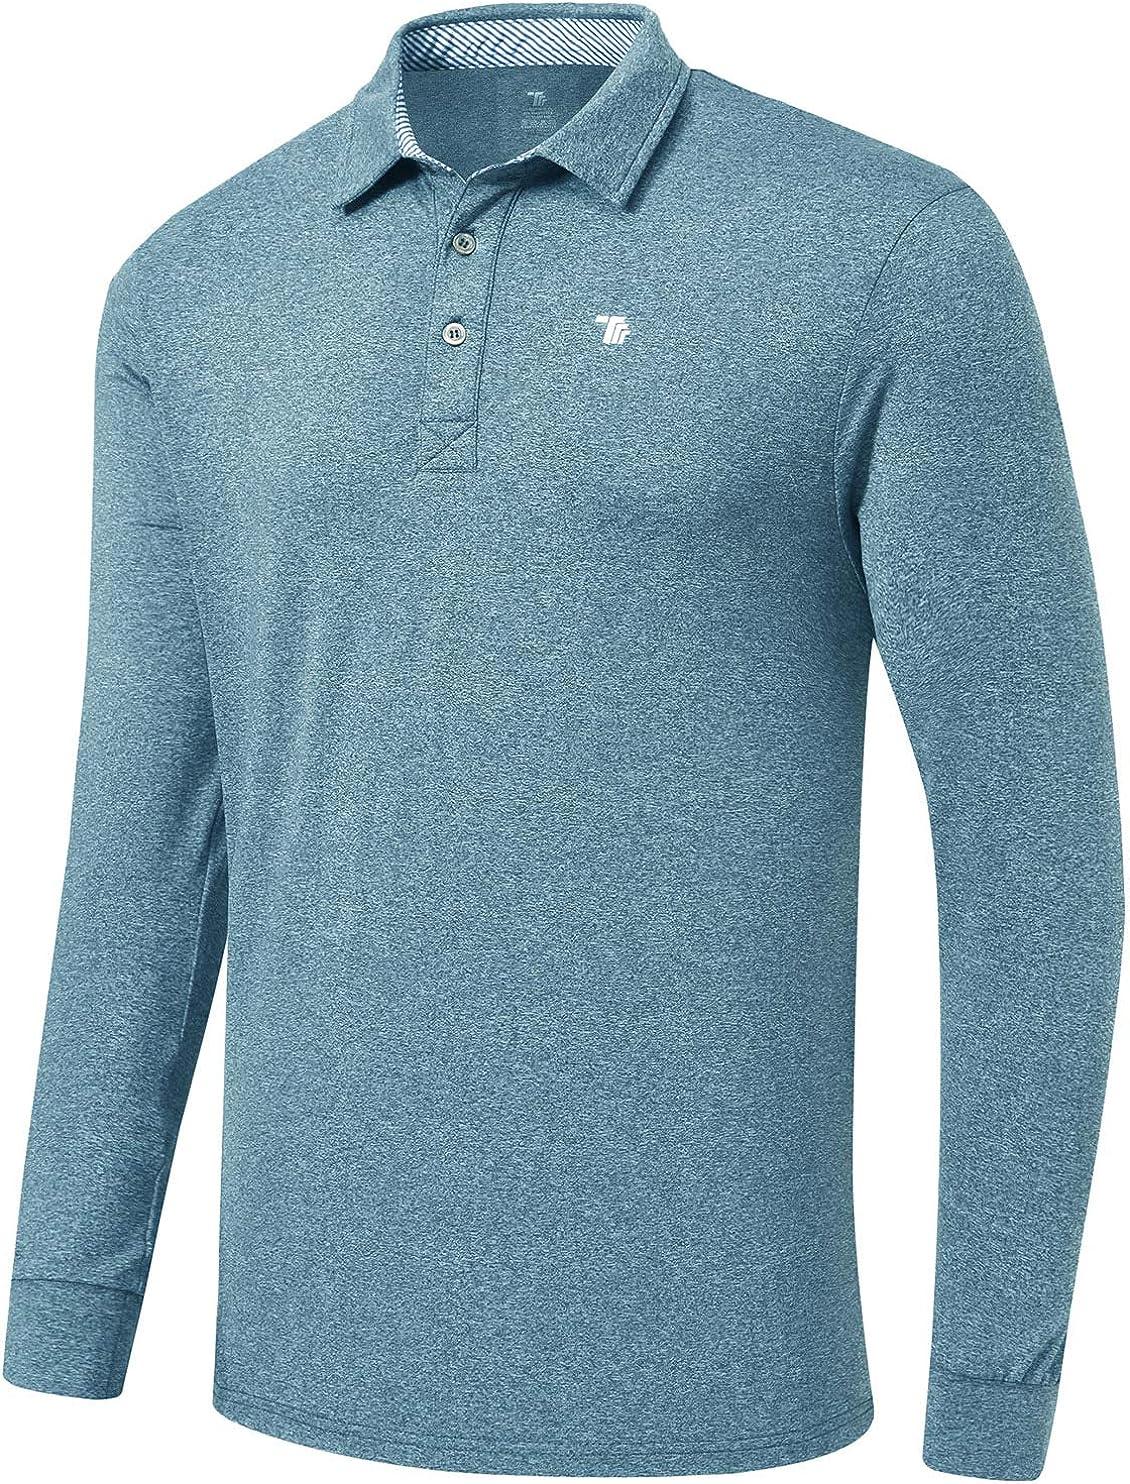 MoFiz Men's Golf Shirts Polo Shirts Athletic Casual T-Shirt Quick Dry Long Sleeve